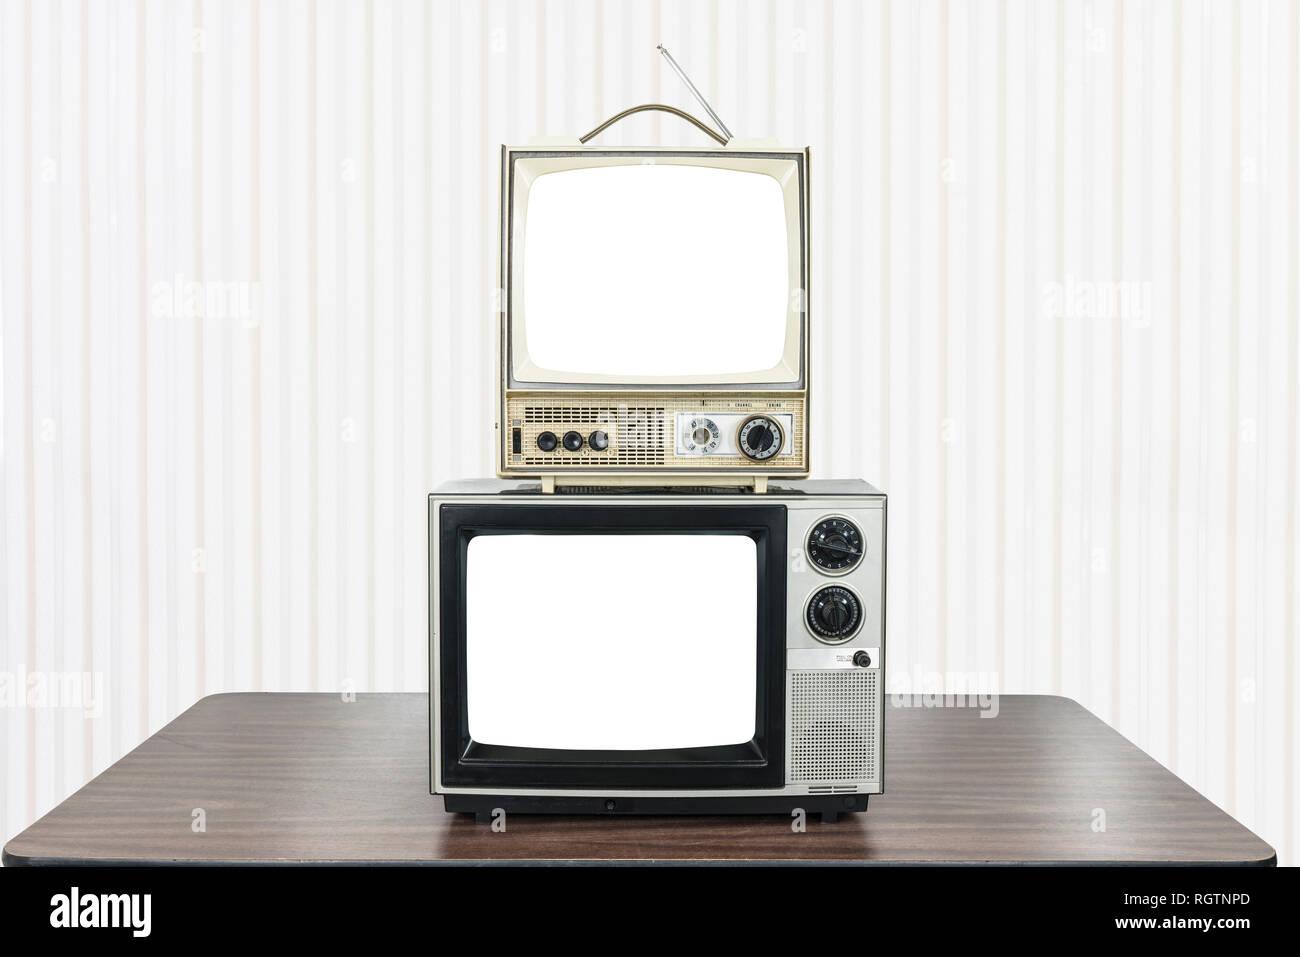 Television Set 1980s Stock Photos & Television Set 1980s